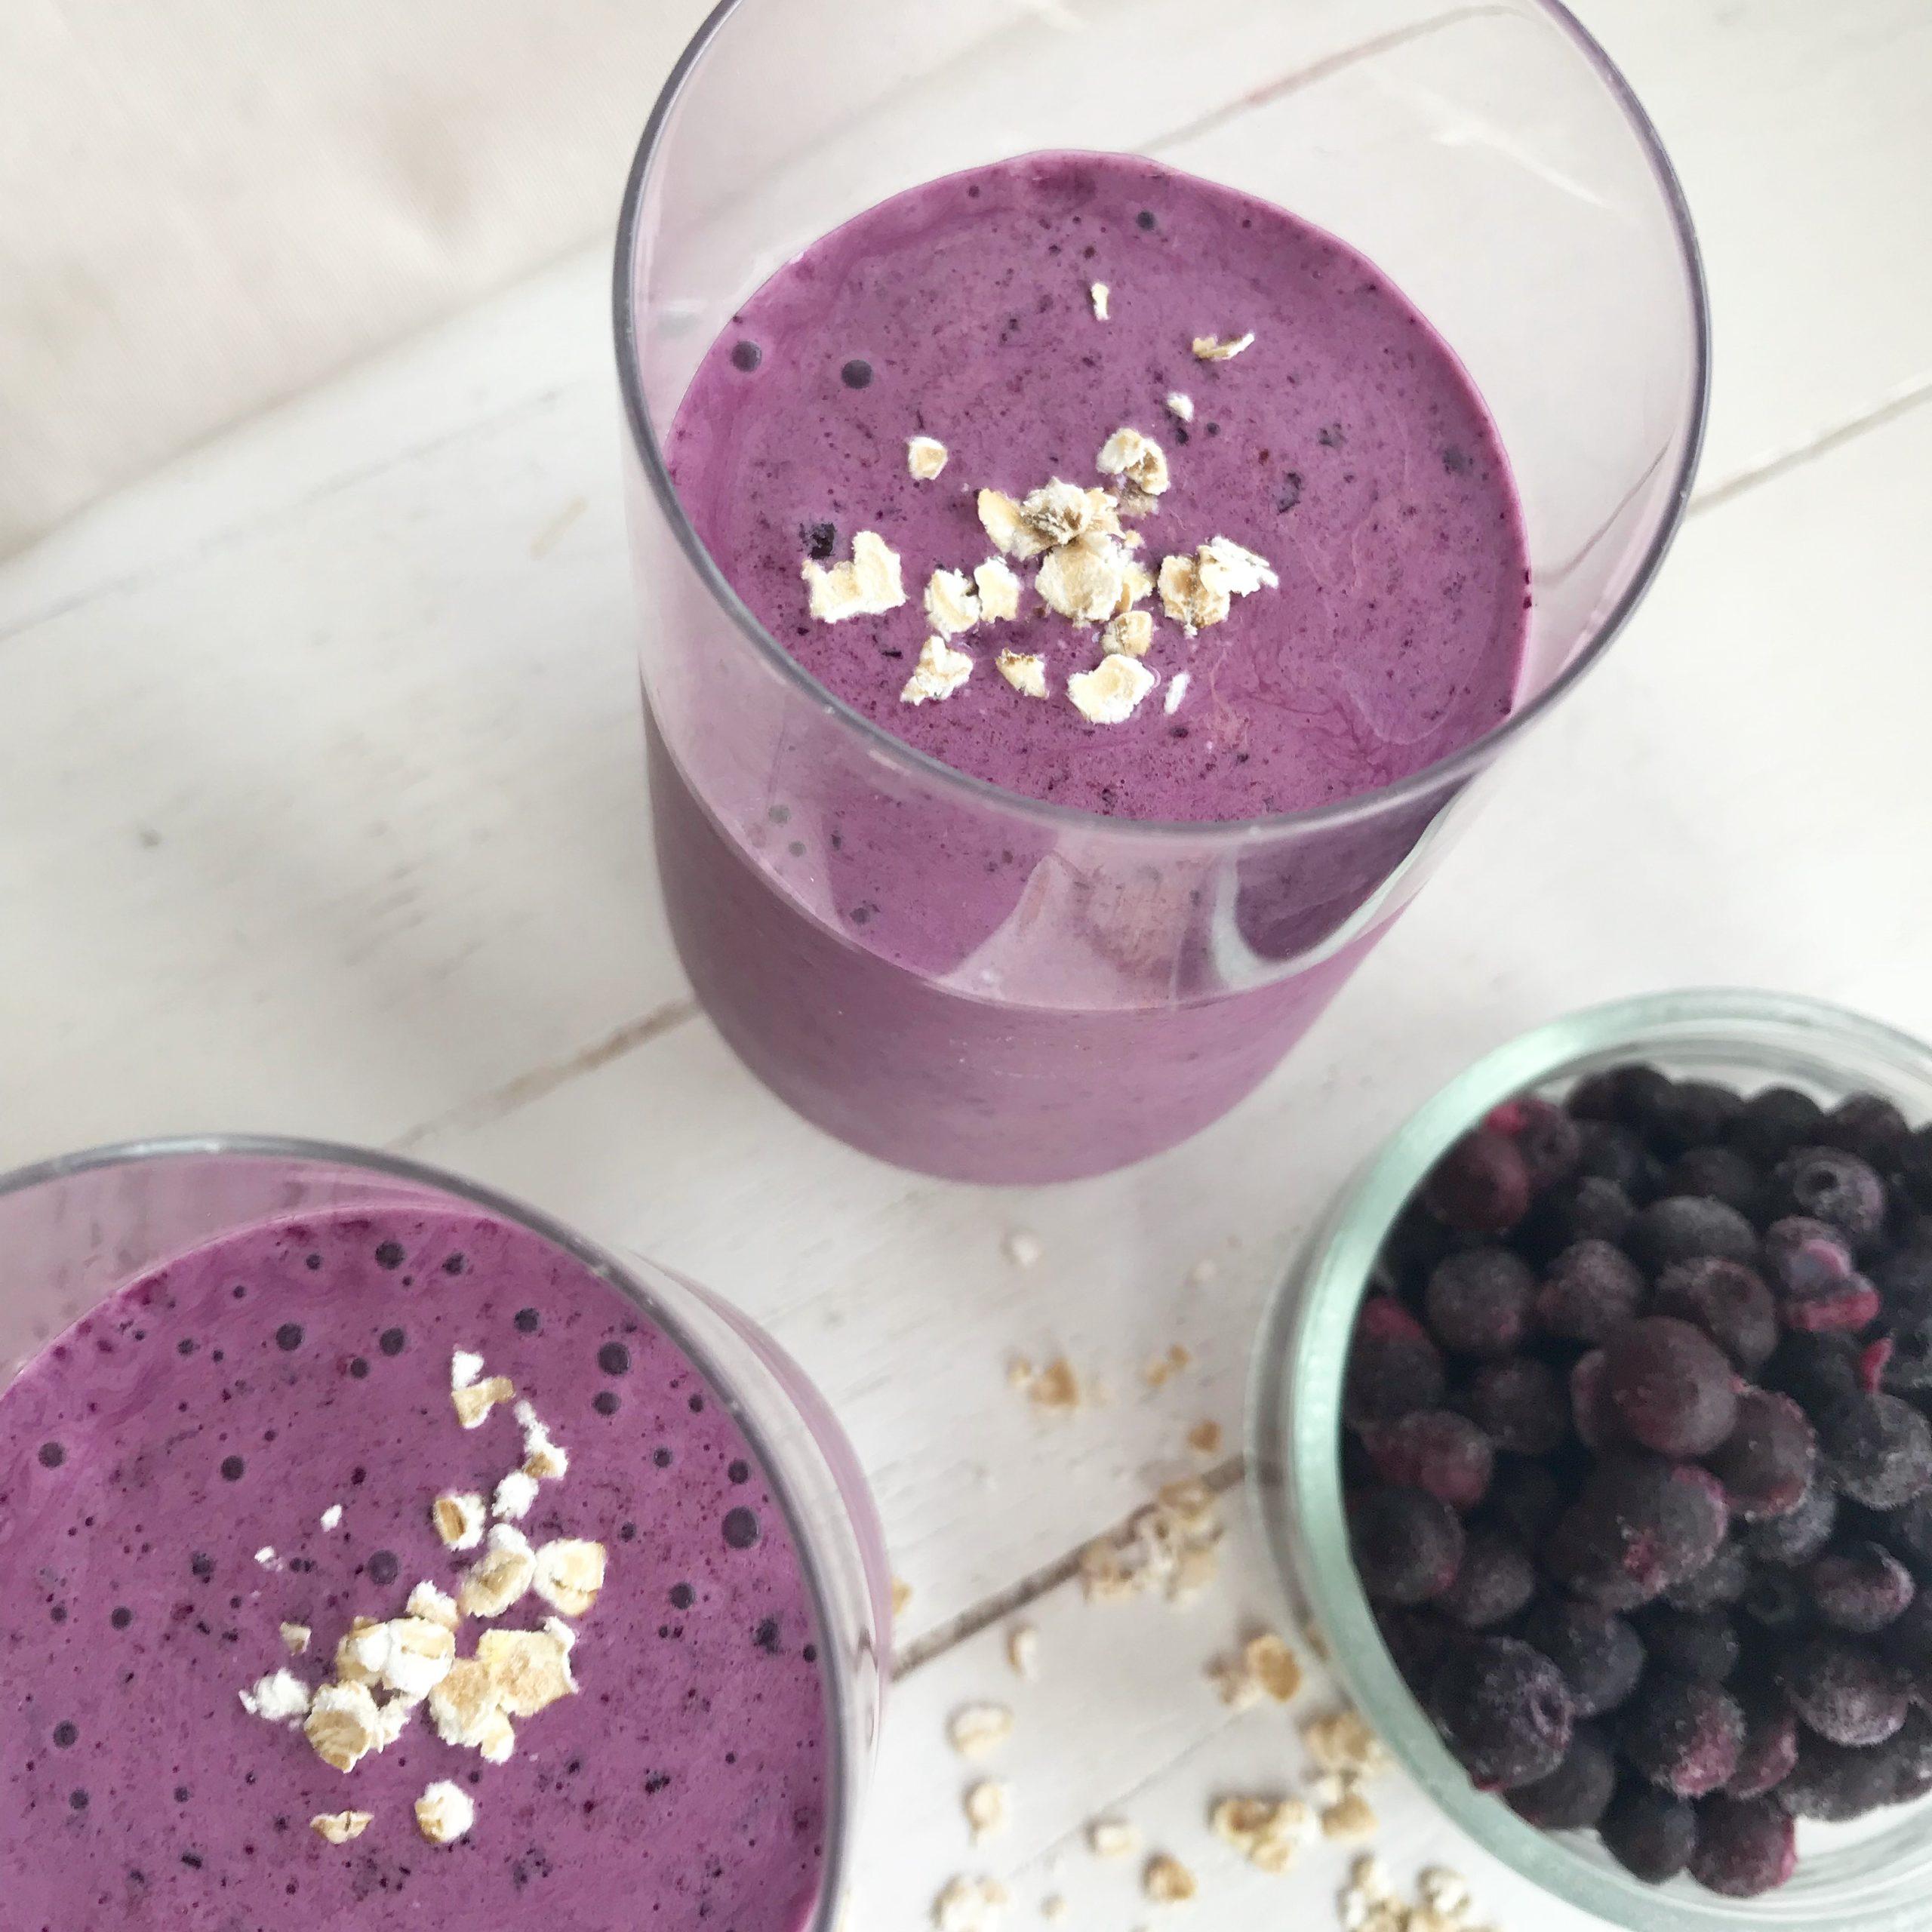 eiwitrijke smoothie, blueberry smoothie, gymjunkies, gezonde recepten, eiwitrijk ontbijt